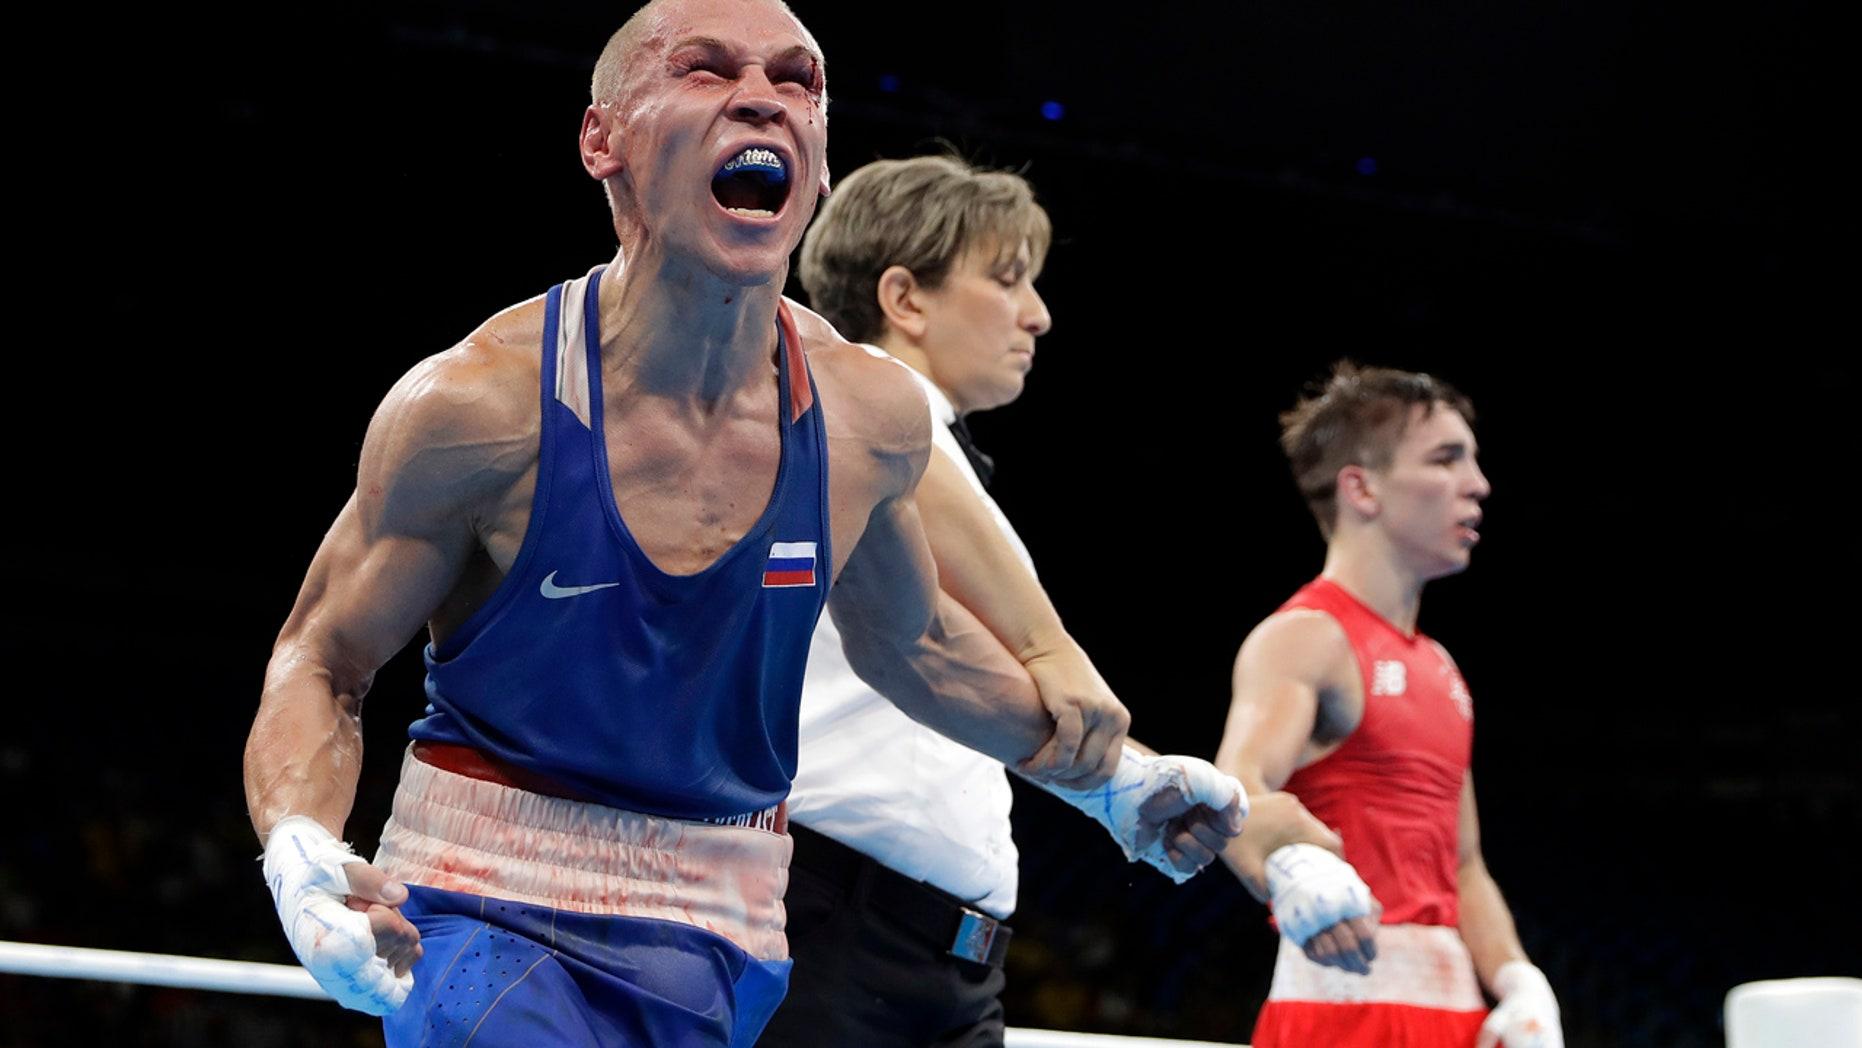 Aug. 16, 2016: Russia's Vladimir Nikitin, left, reacts as he won a men's bantamweight 56-kg quarterfinals boxing match against Ireland's Michael John Conlan at the 2016 Summer Olympics in Rio de Janeiro, Brazil.